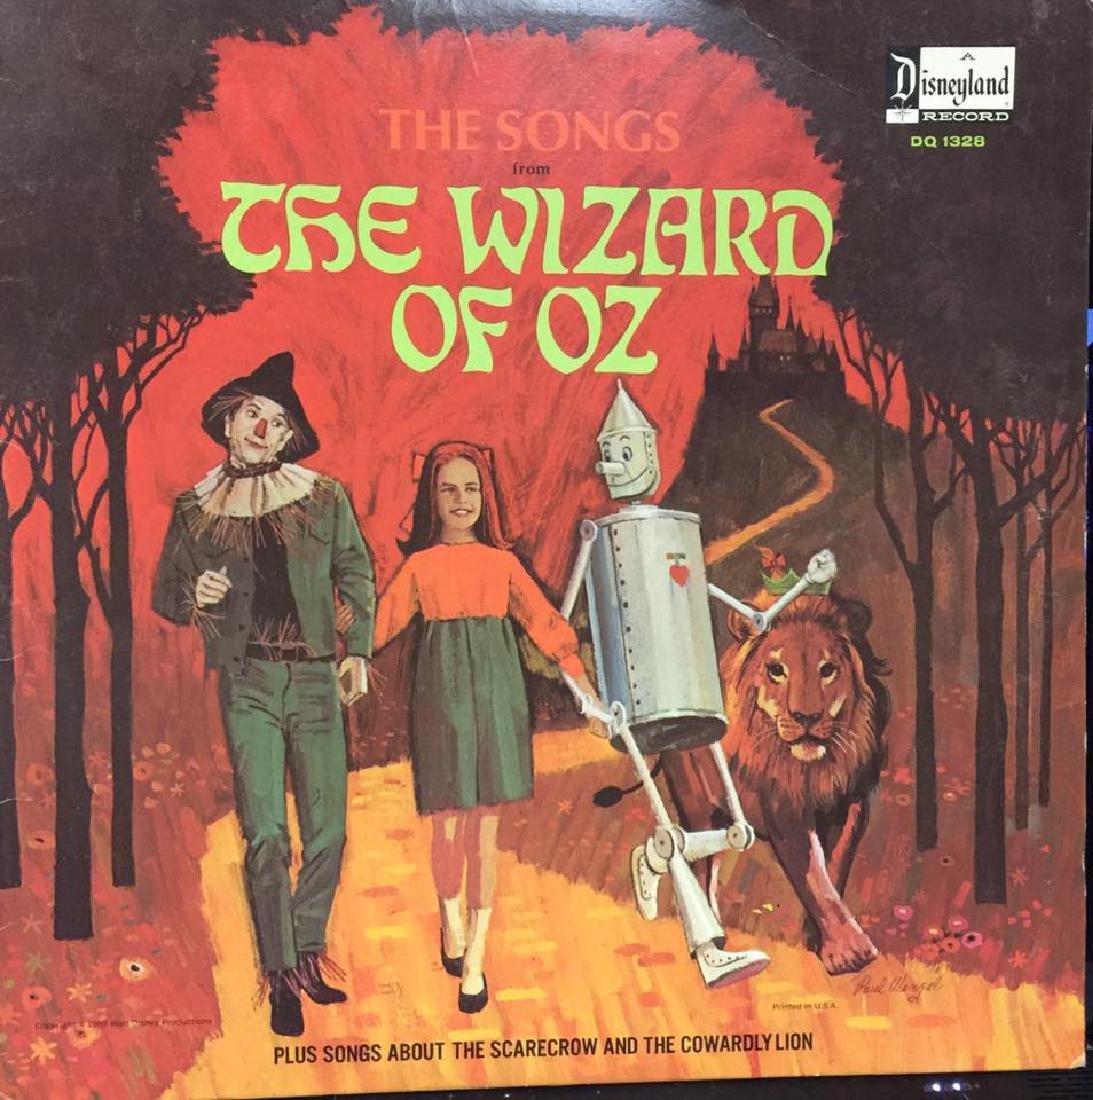 VINTAGE DISNEYLAND WIZARD OF OZ RECORD ALBUM